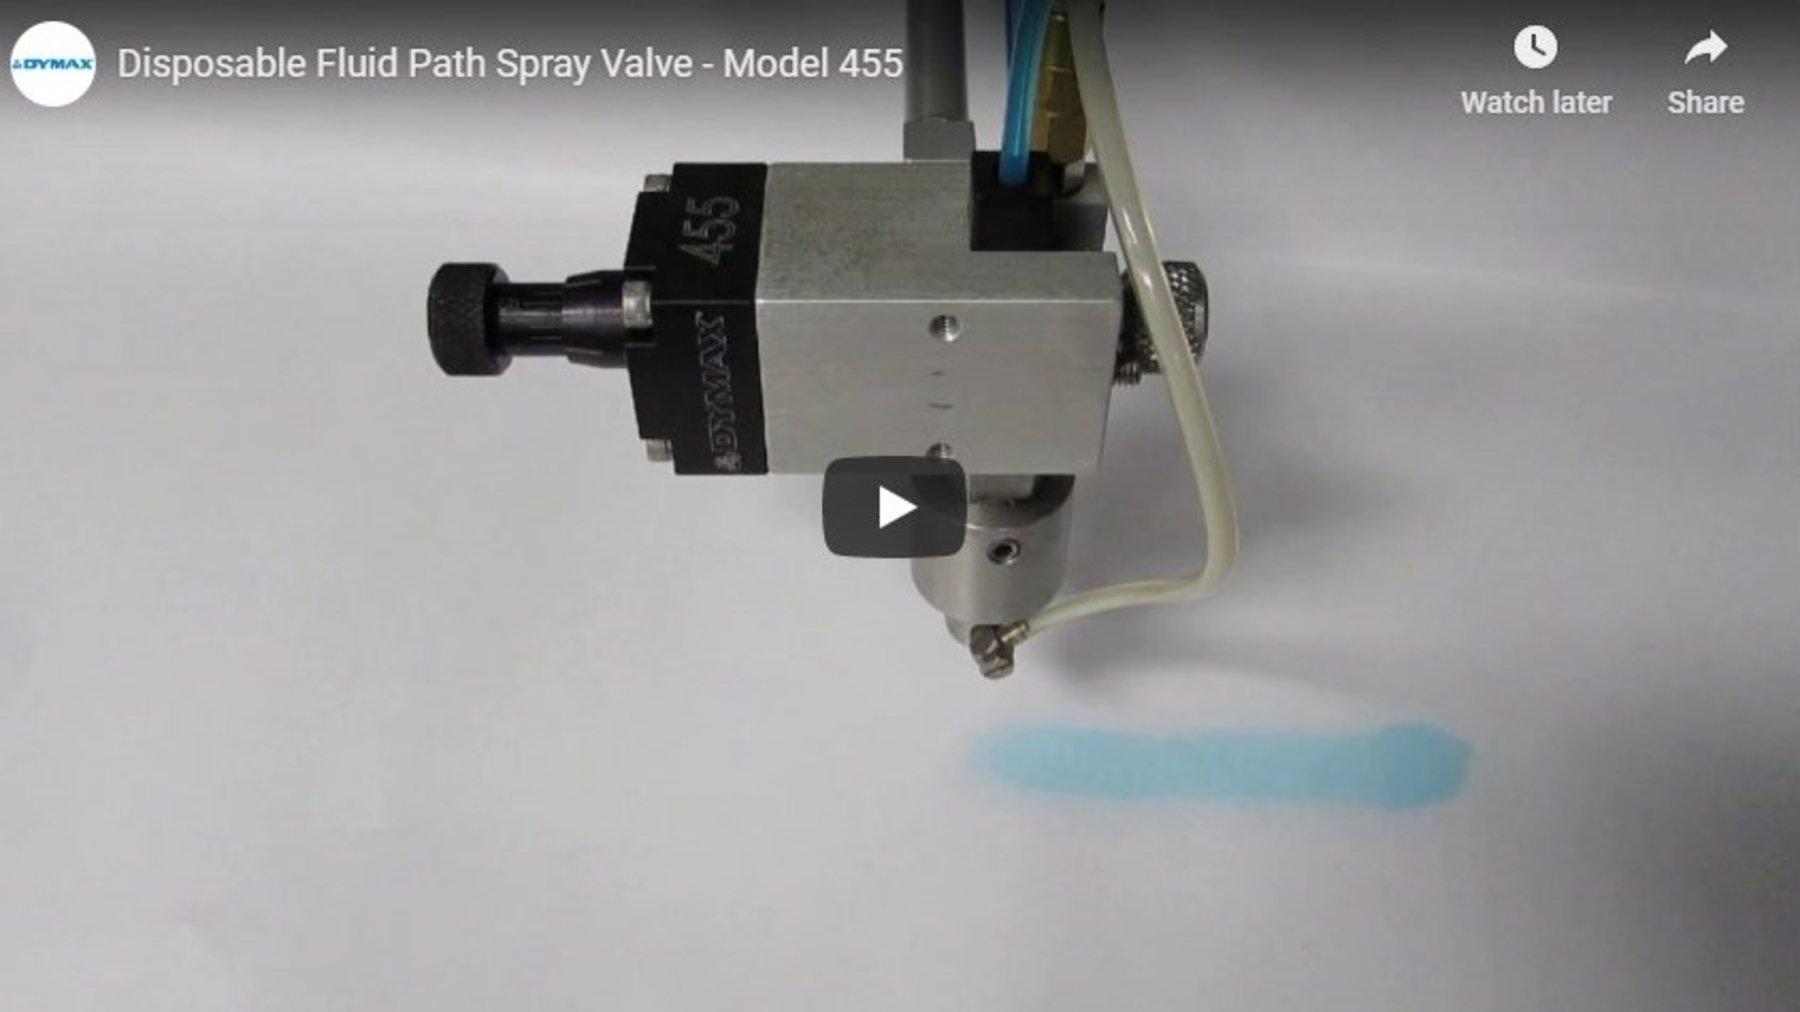 Model 455 Disposable Fluid Path Spray Valve